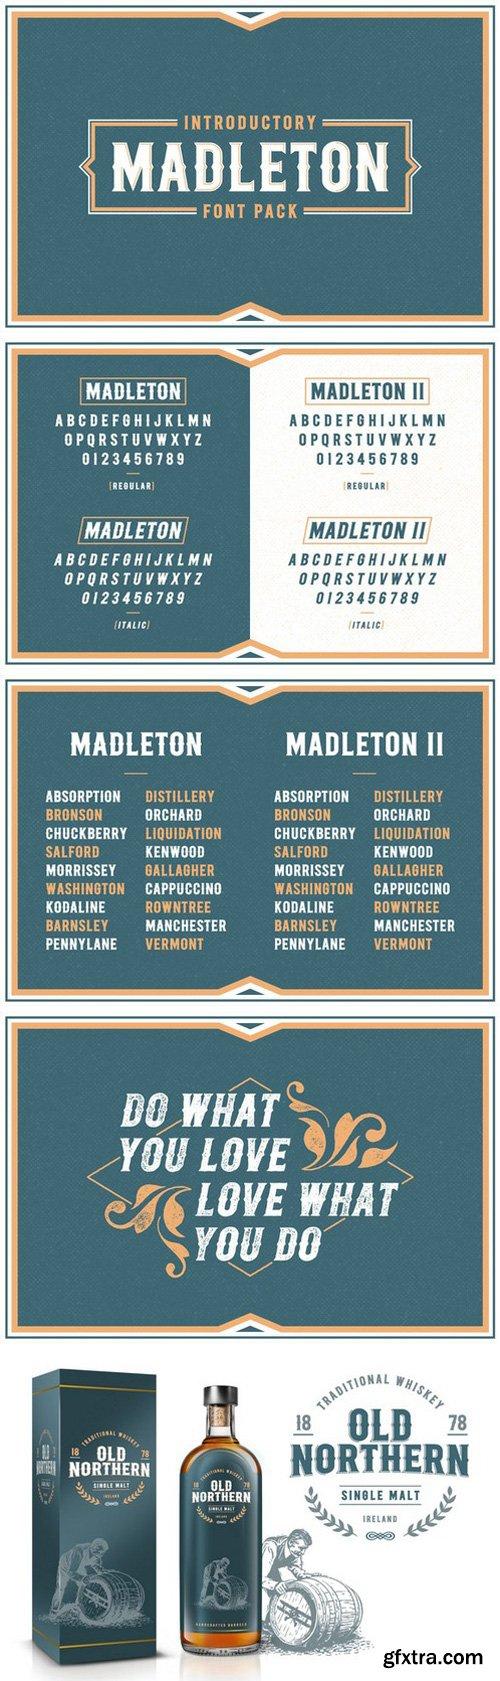 Download CM - Madleton Font Pack - Free | Font packs, Retro ...